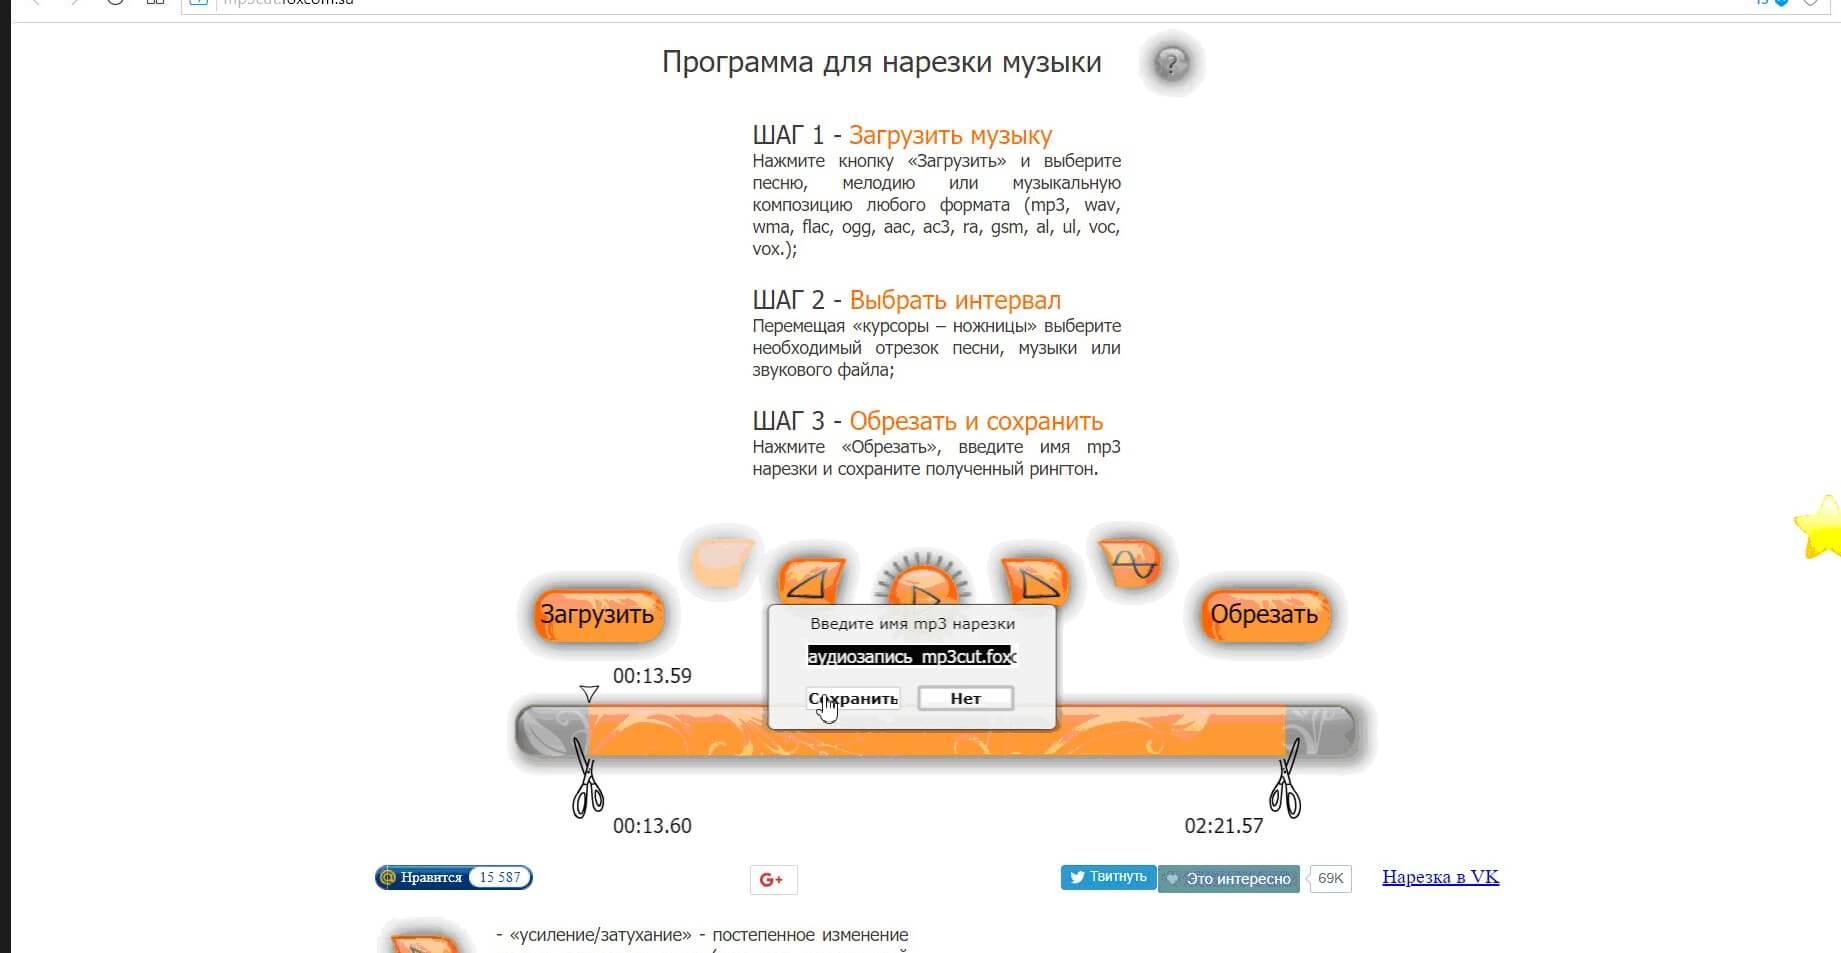 mp3cut.foxcom.su сервис для онлайн редактирования